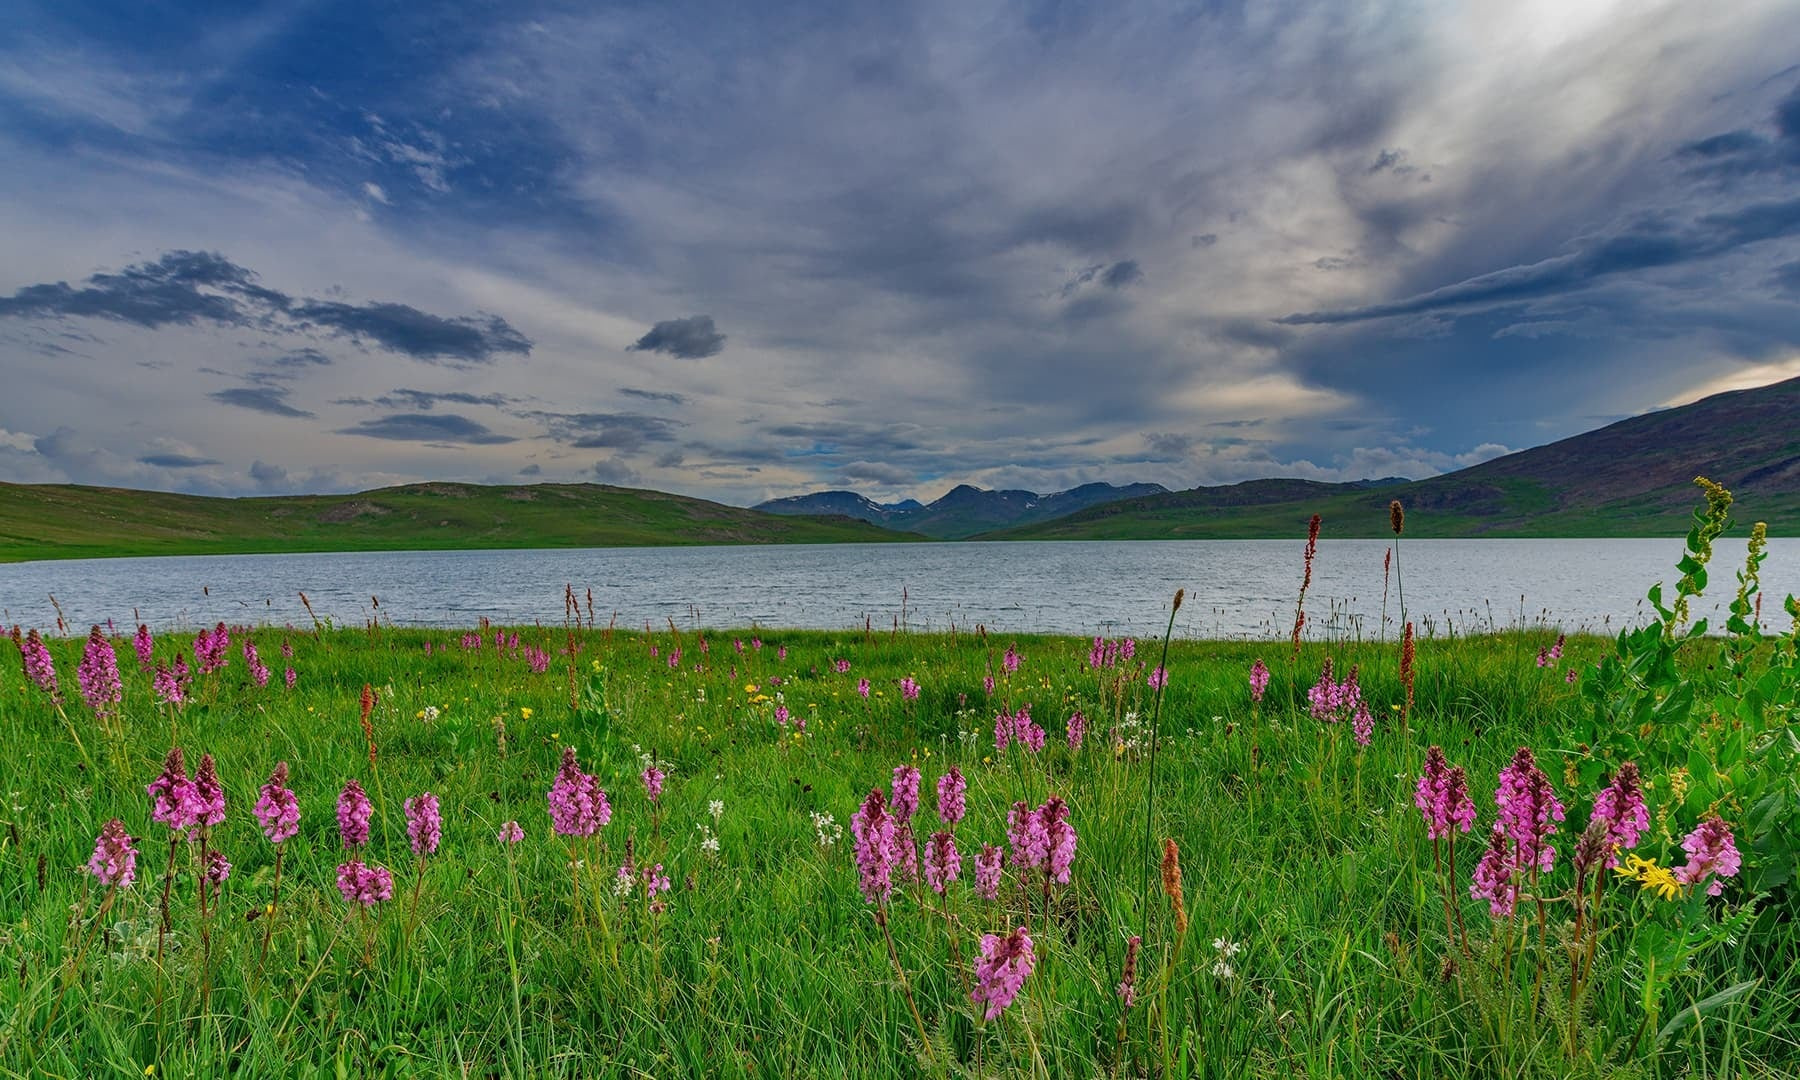 On the edge of Sheosar Lake. — Photo by Syed Mehdi Bukhari